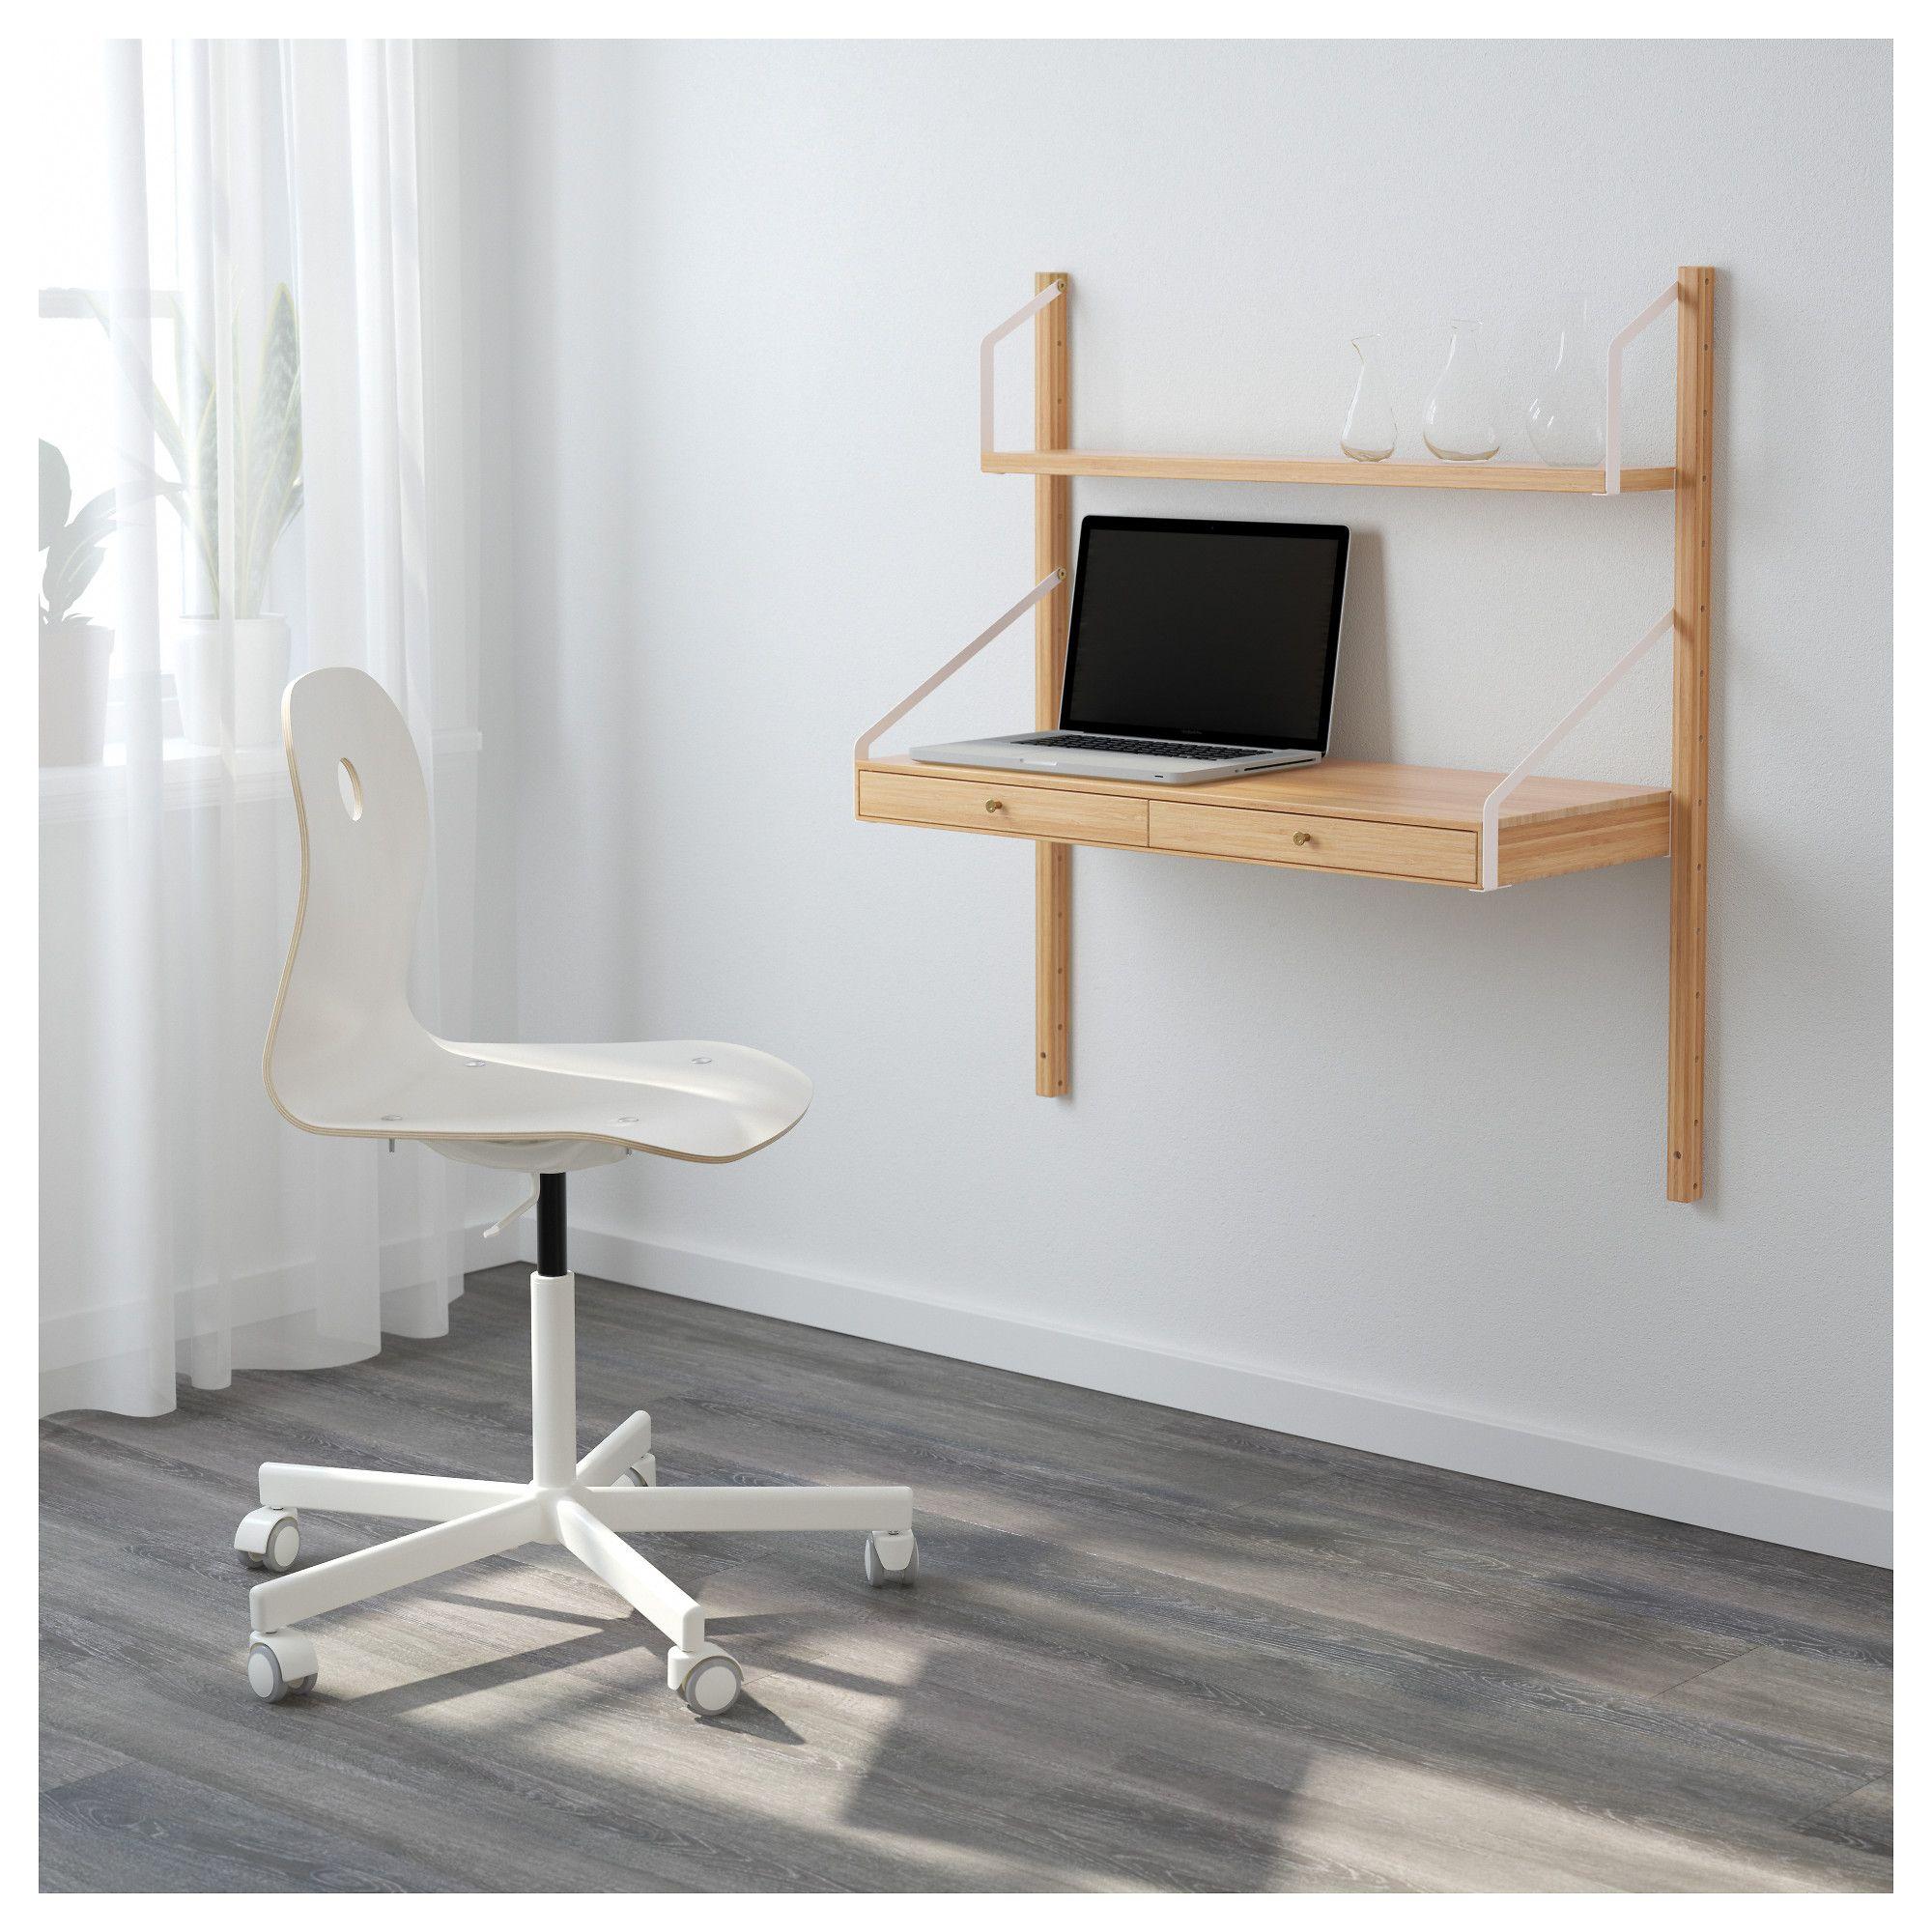 Ikea Svalnas Wall Mounted Workspace Combination Bamboo Desks